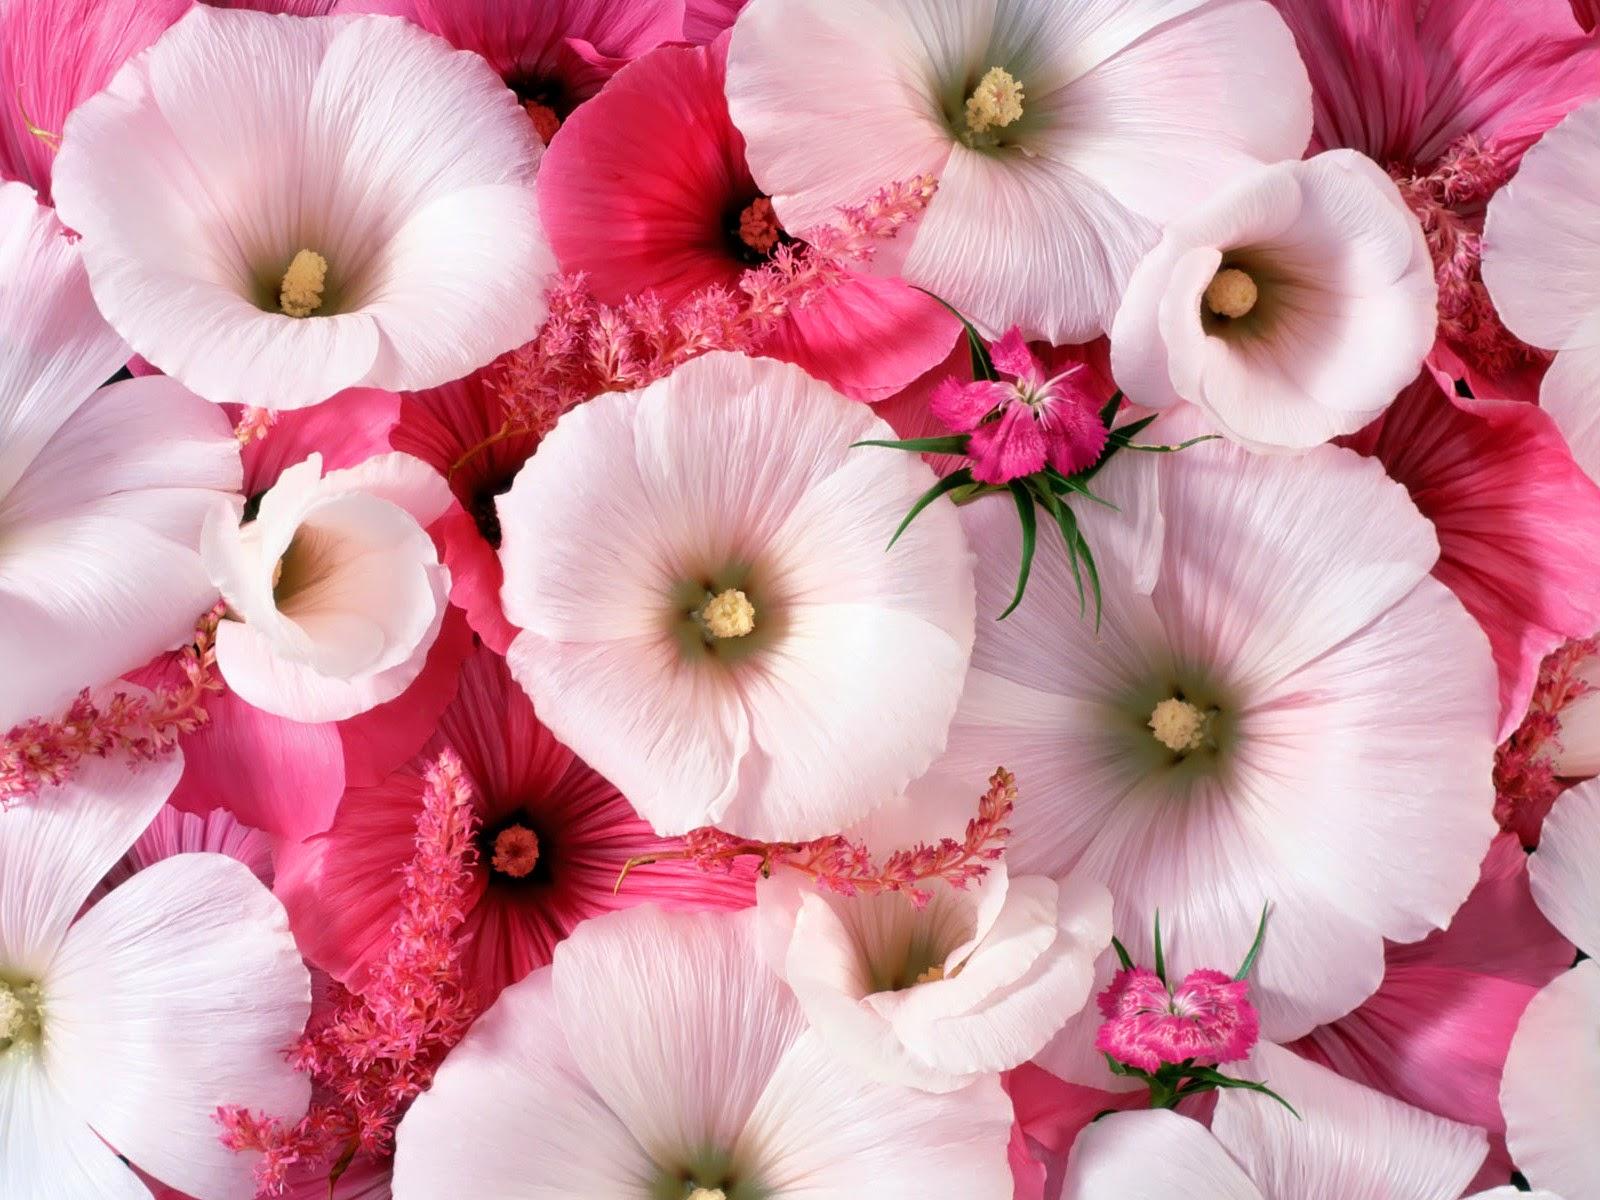 Gambar Bunga Romantis Bunga Sepatu Cantik